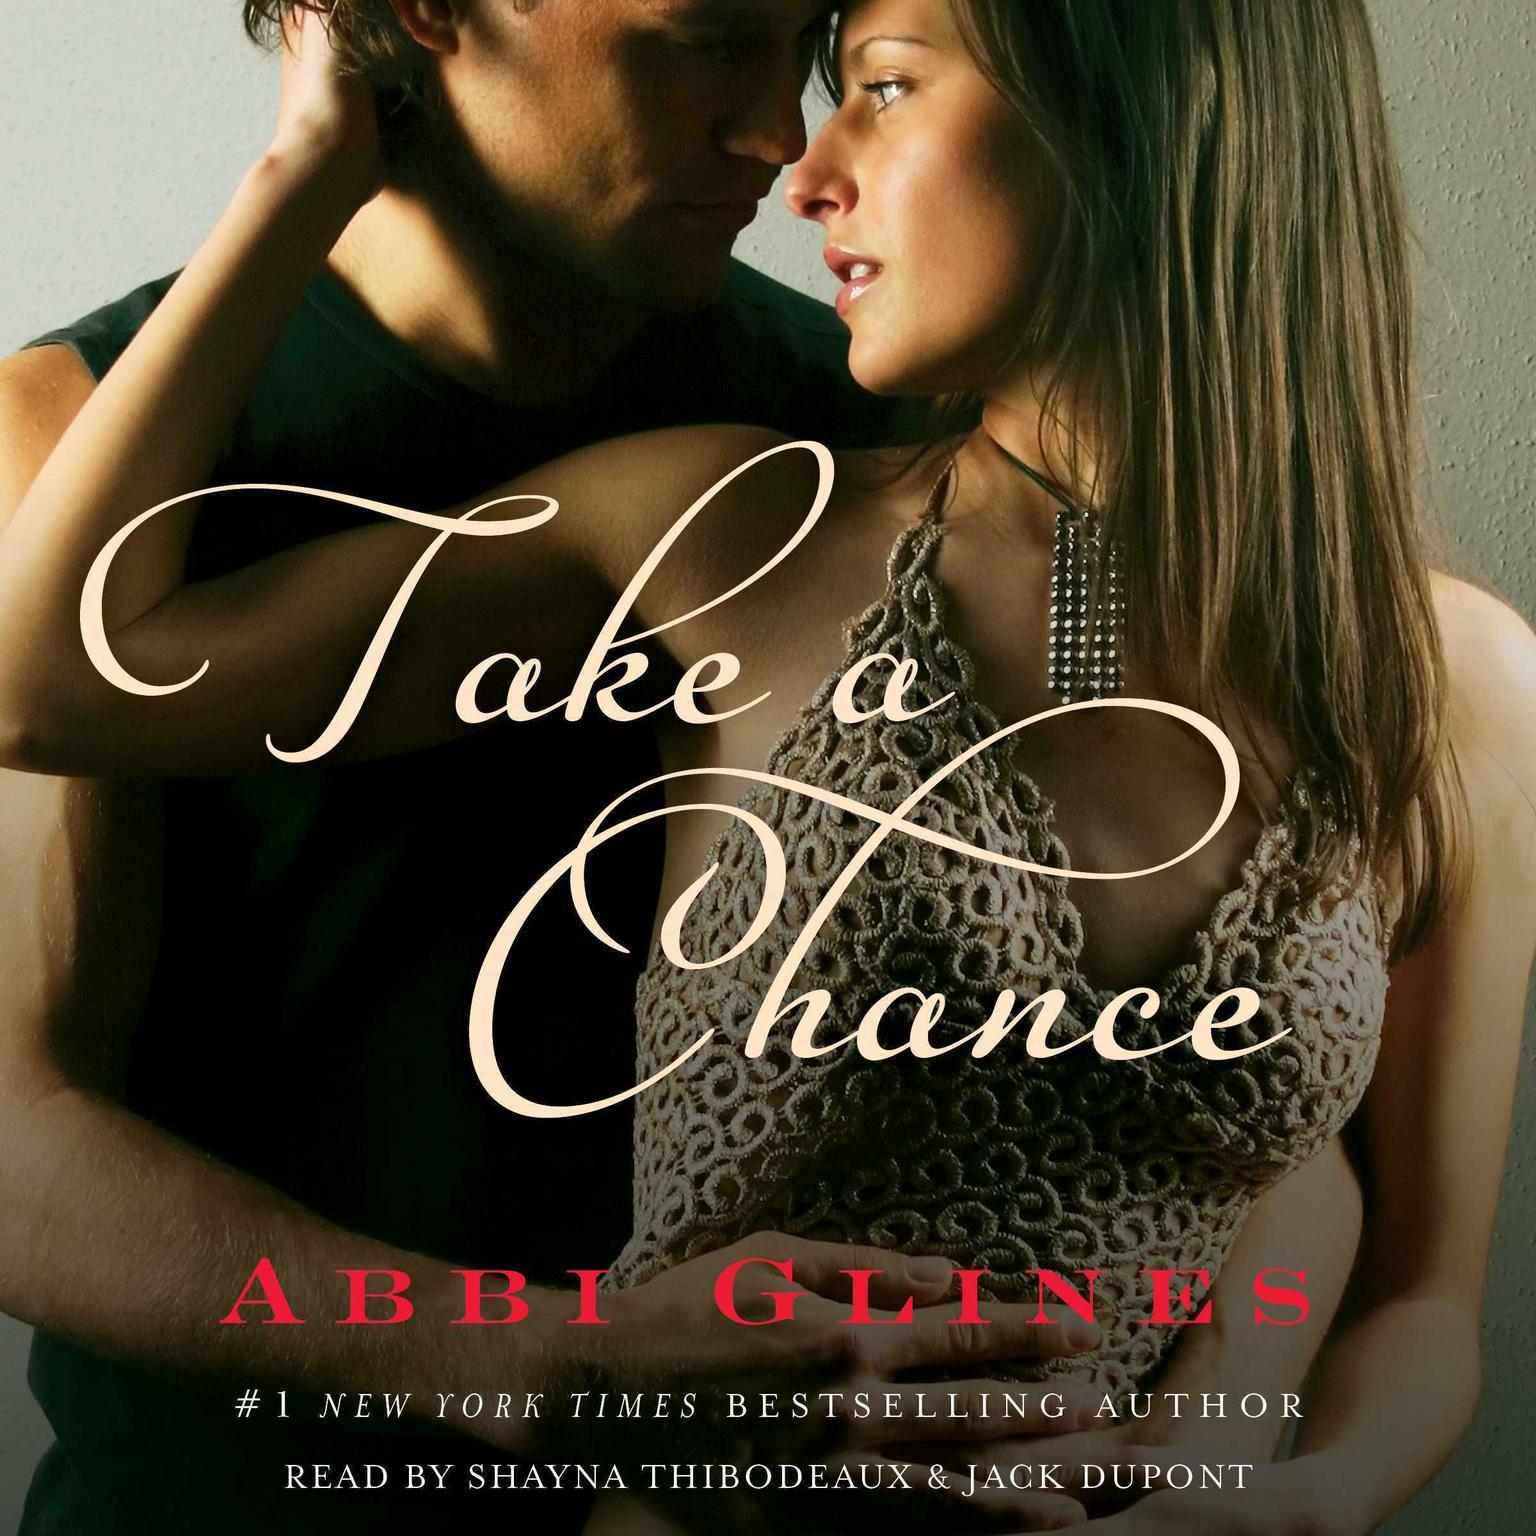 A teens take a chance